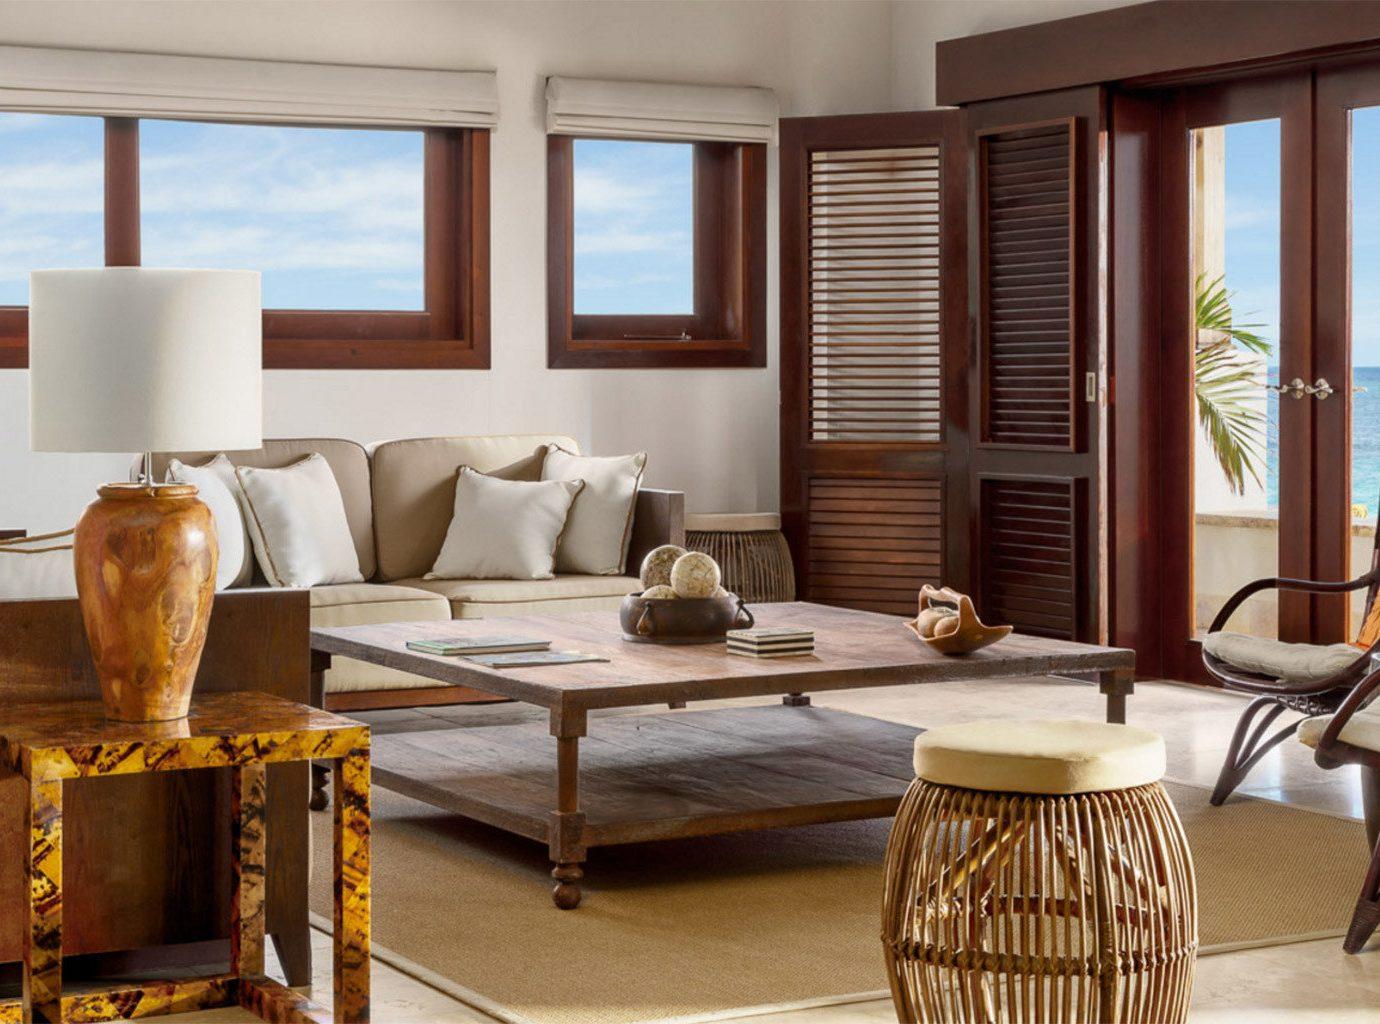 Hotels floor window indoor Living room property dining room living room home interior design Suite furniture estate window covering real estate wood Design